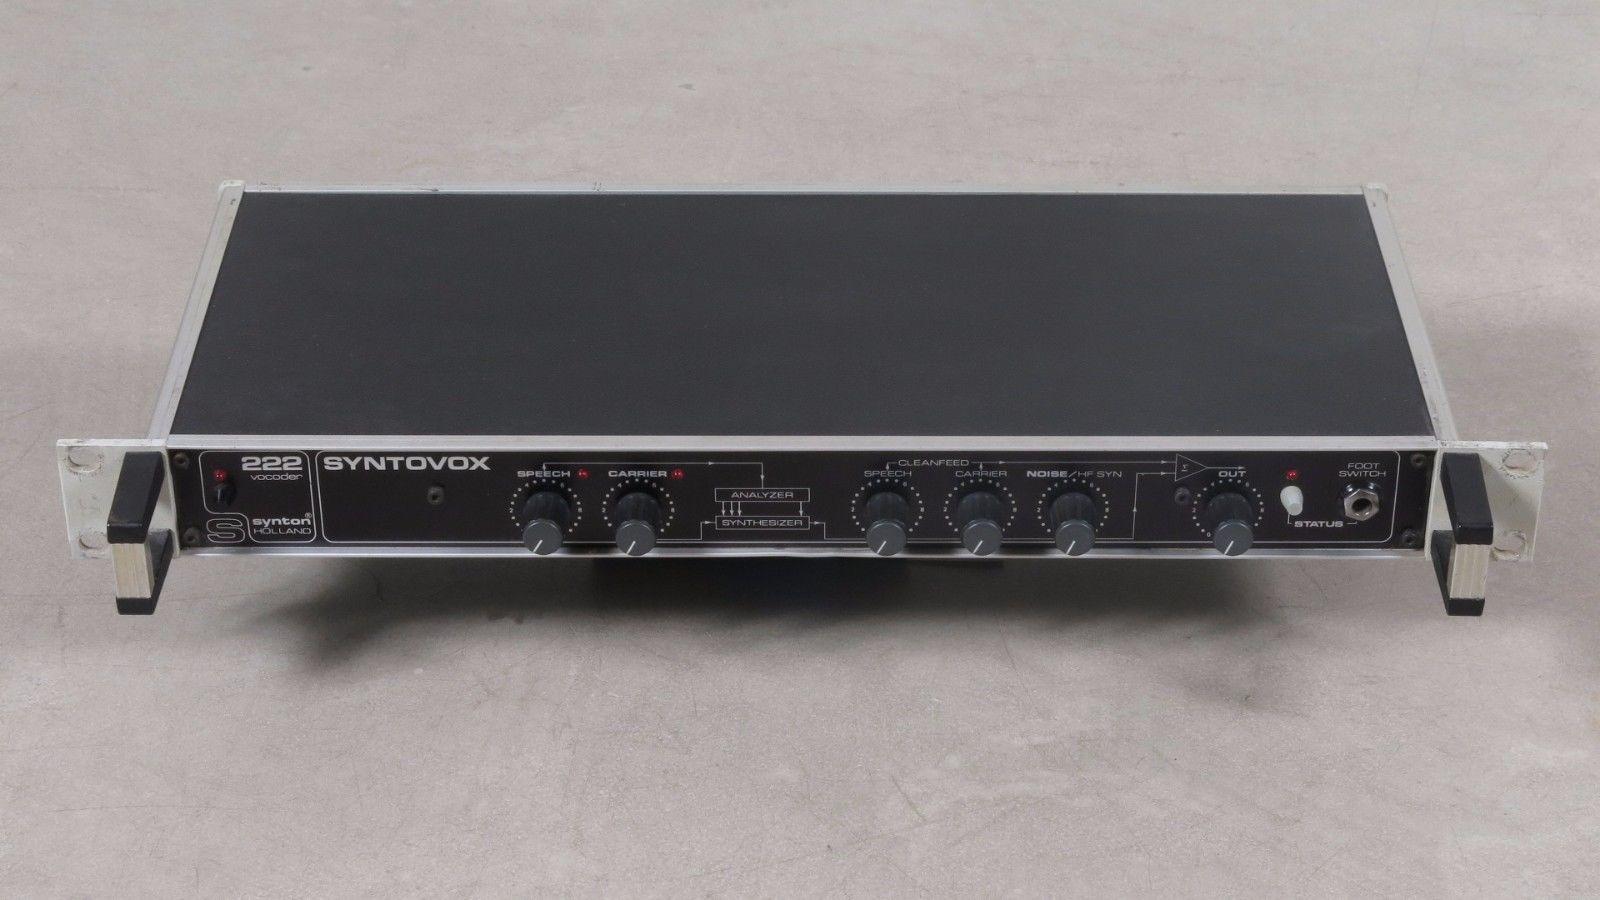 Syntovox 222 Vocoder